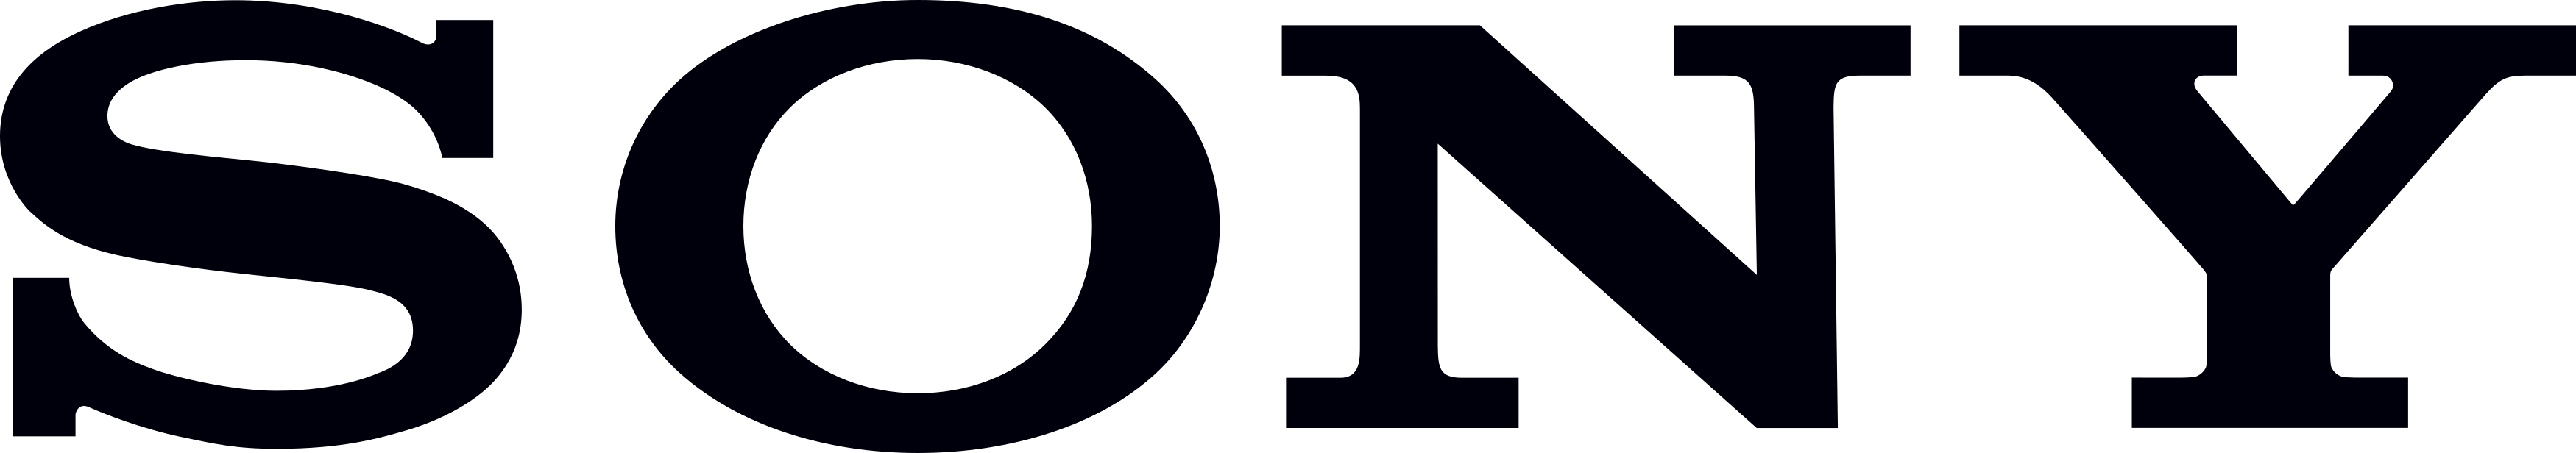 sony logo 1 - Sony Logo